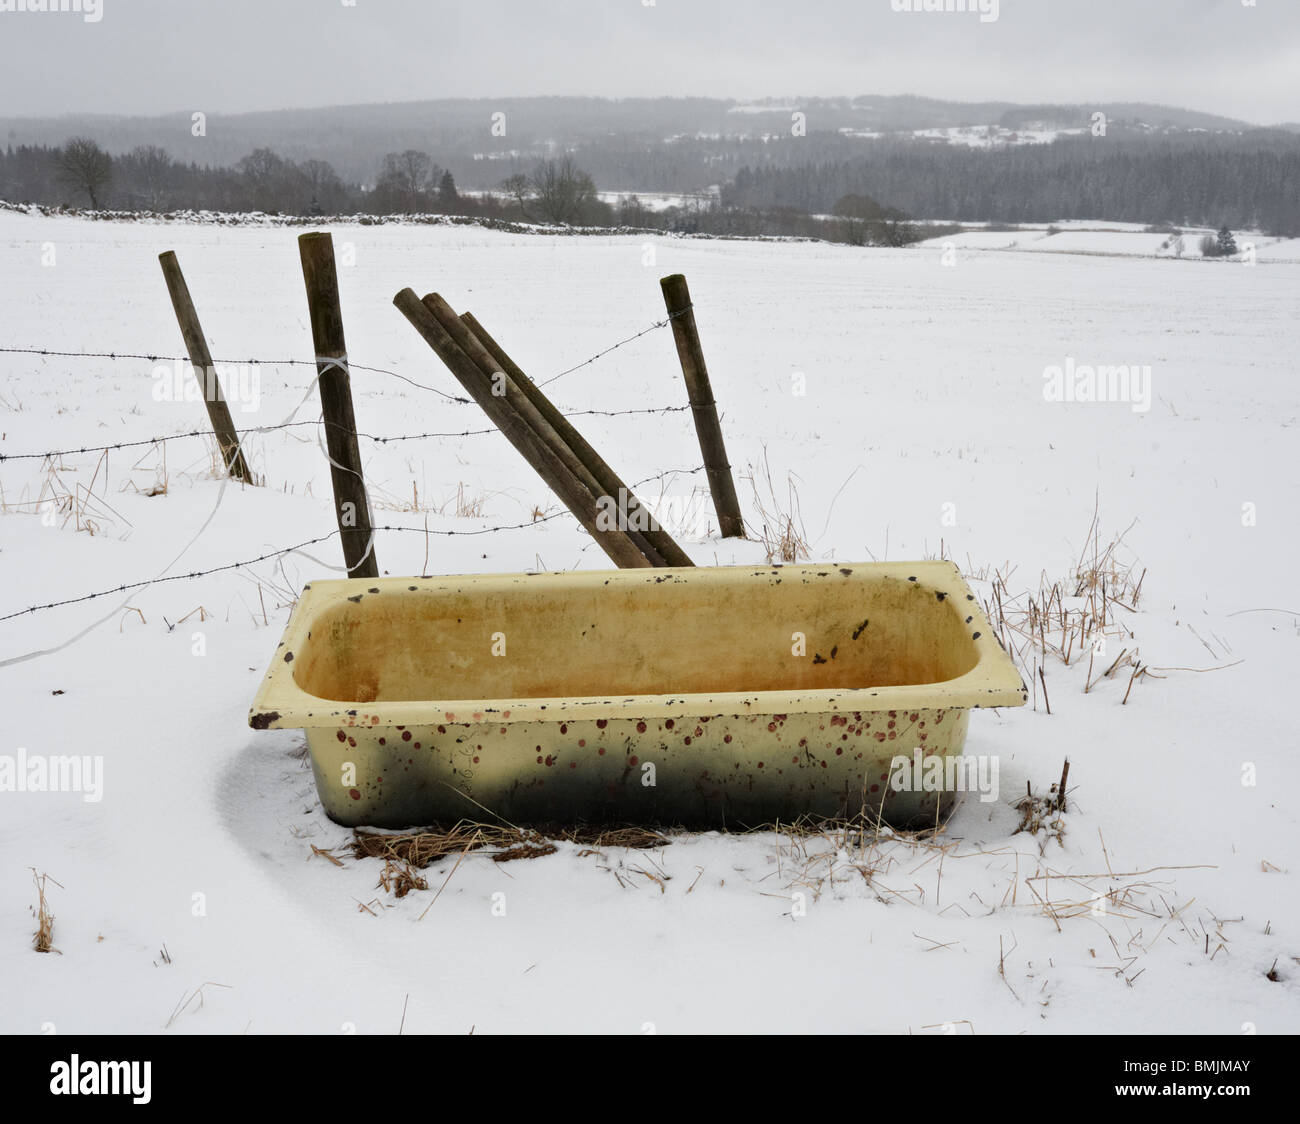 Scandinavia, Sweden, Vastergotland, Old bathtub in snow - Stock Image